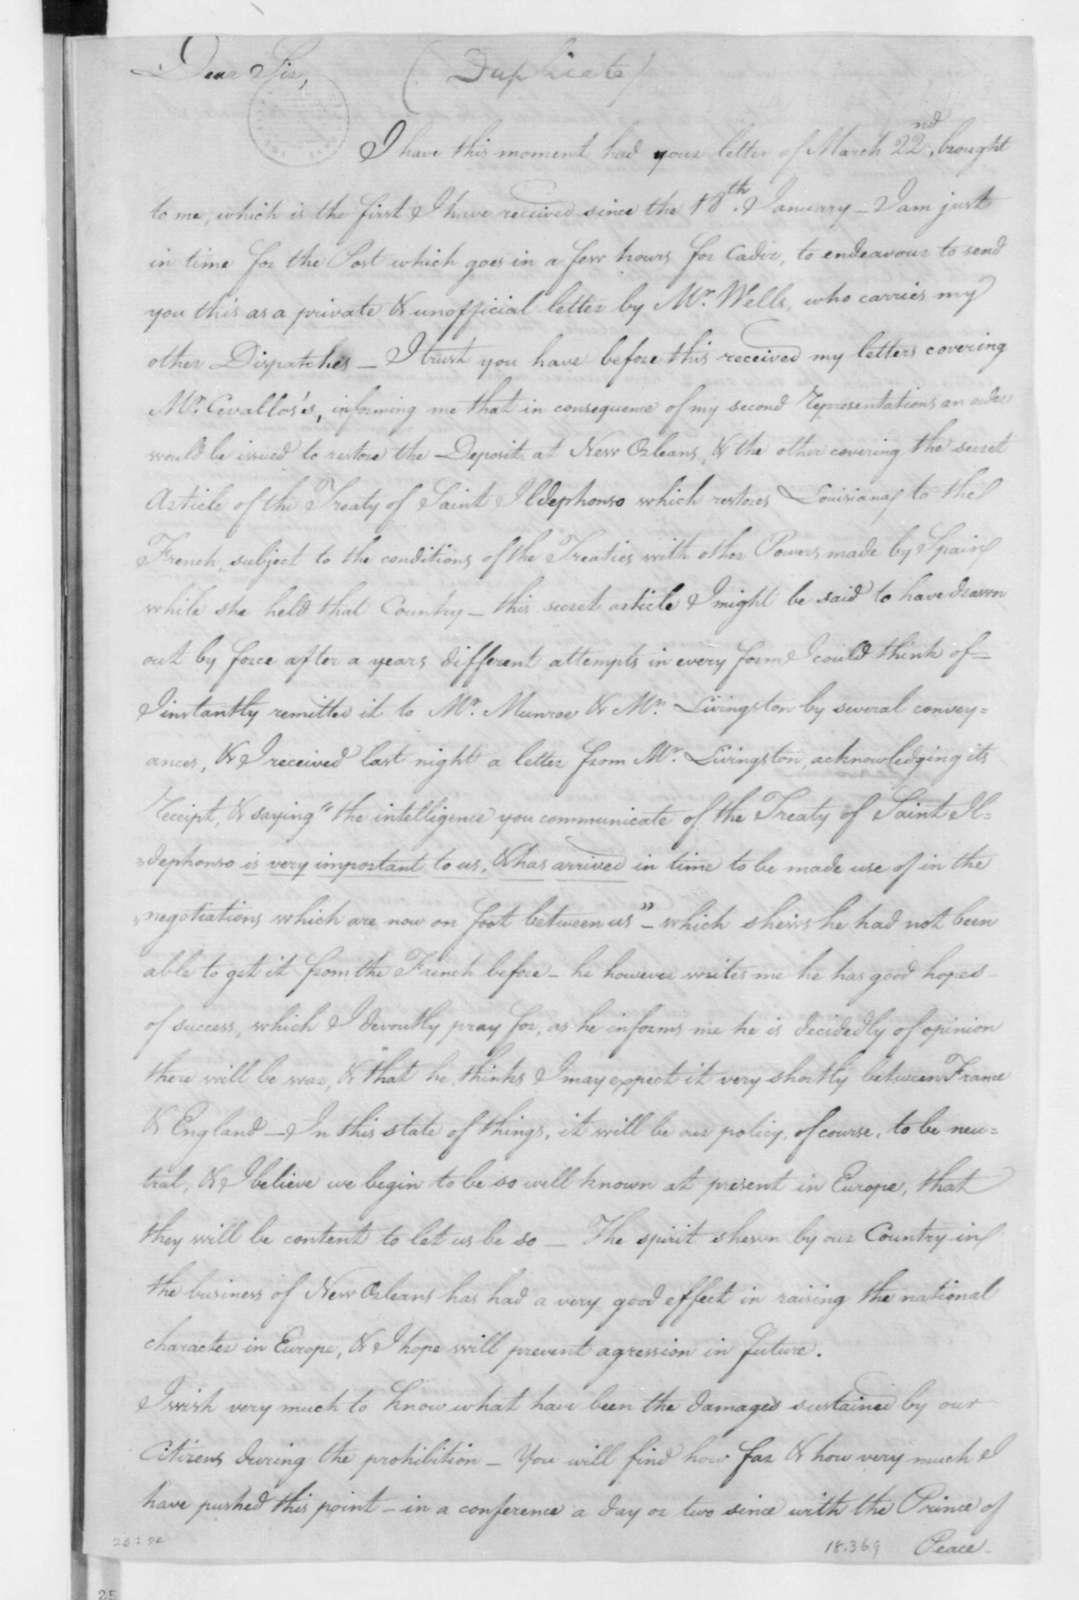 Charles Pinckney to James Madison, May 14, 1803.